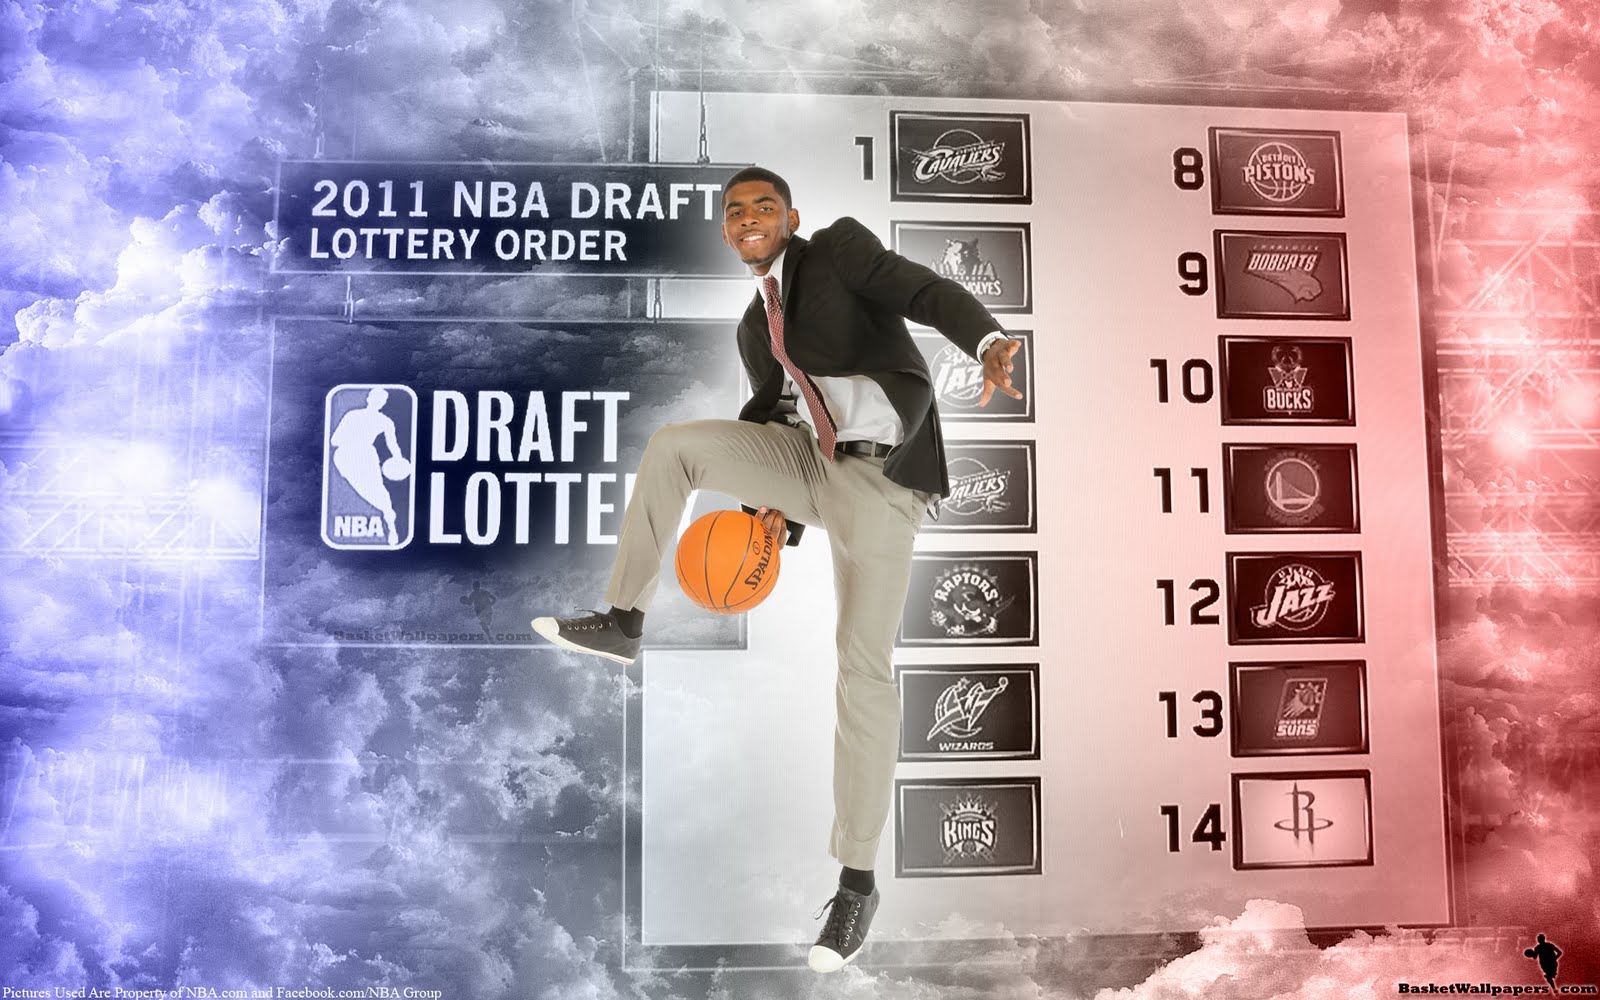 2011 Nba Finals Game 2 Mini Movie | All Basketball Scores Info